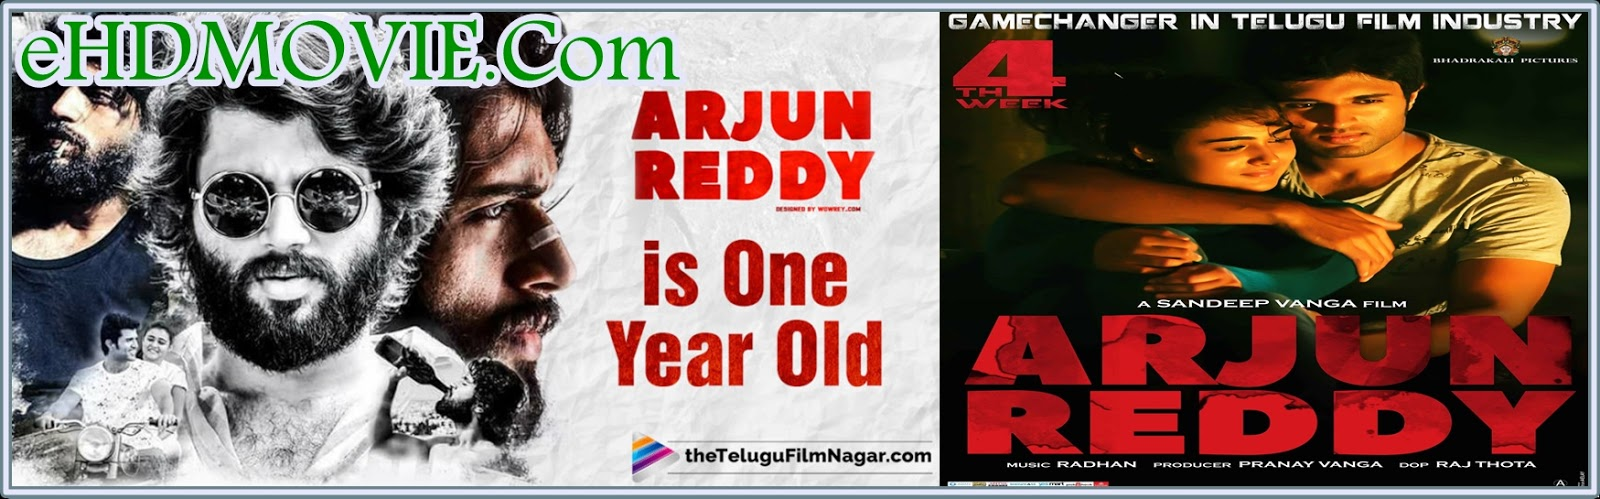 Arjun Reddy 2017 Full Movie Telegu 720p - 480p ORG HDRip 600MB - 1.2GB ESubs Free Download